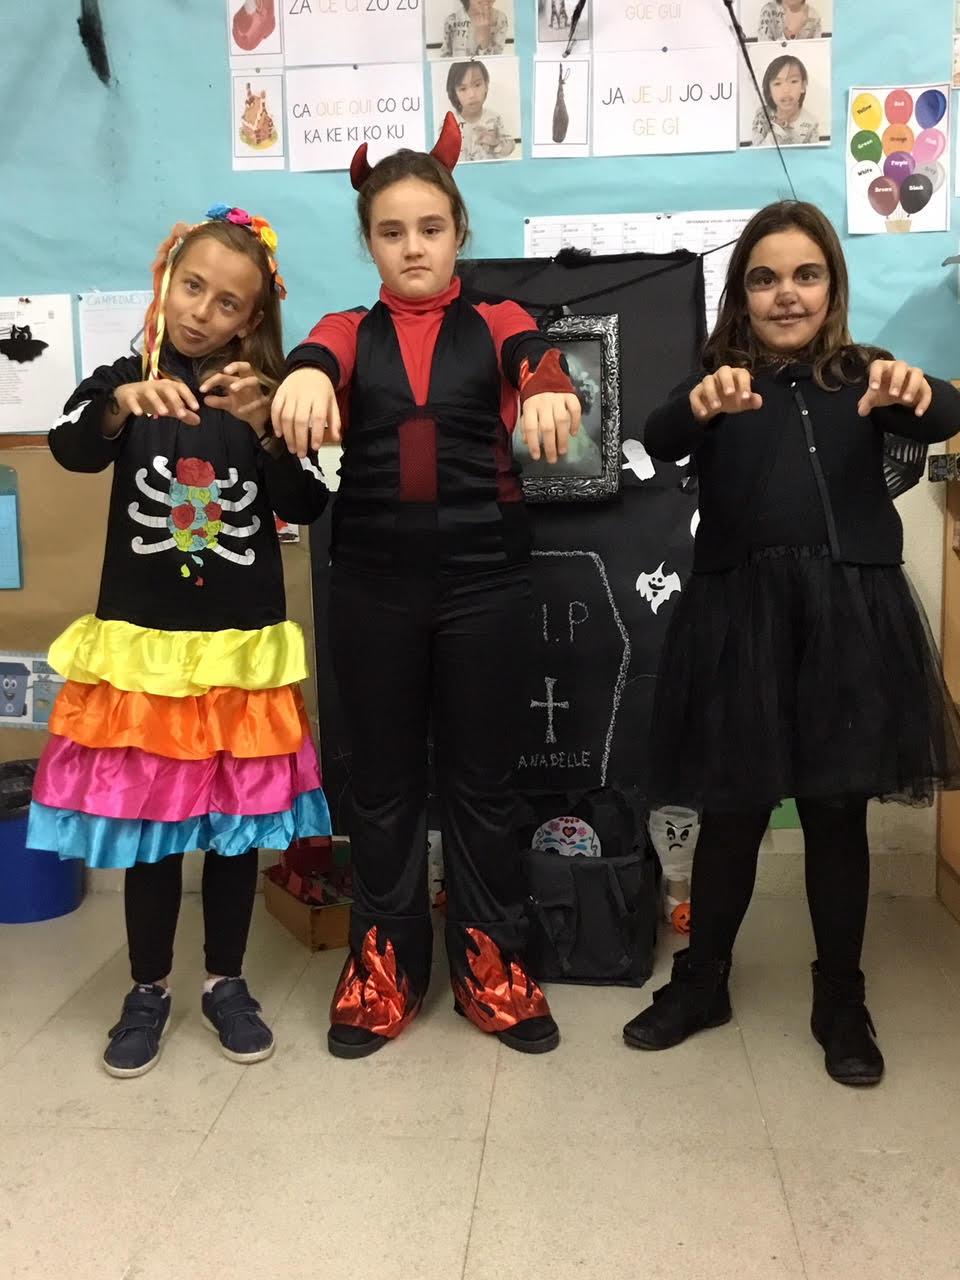 2018_10_31_Cuarto B disfruta en Halloween_CEIP FDLR_Las Rozas 16